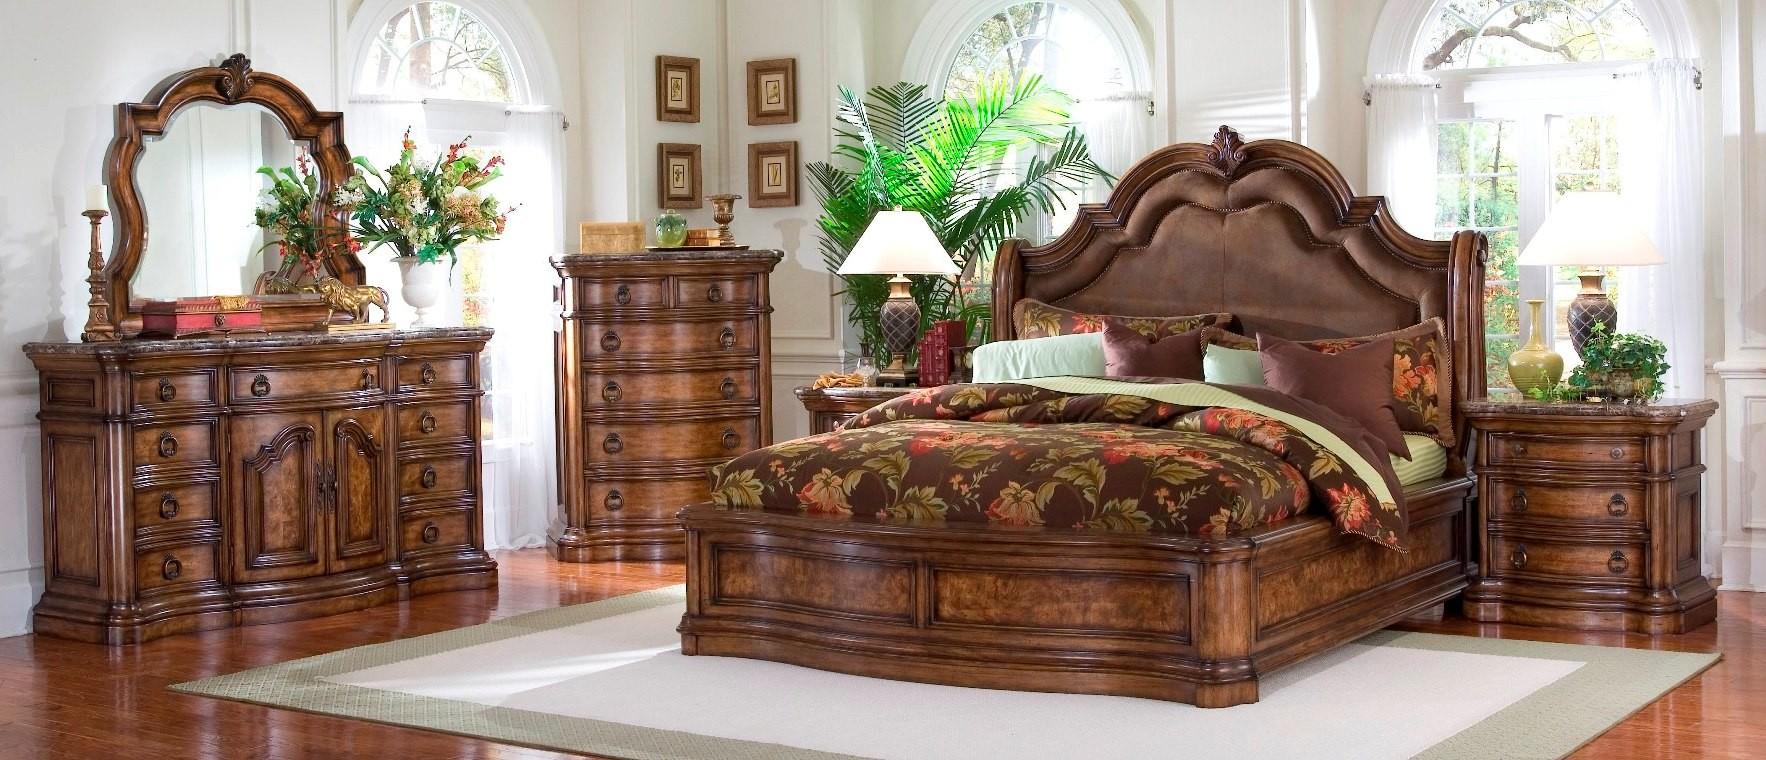 San mateo sleigh bedroom set from pulaski 662170 662171 - King size bedroom sets for sale by owner ...